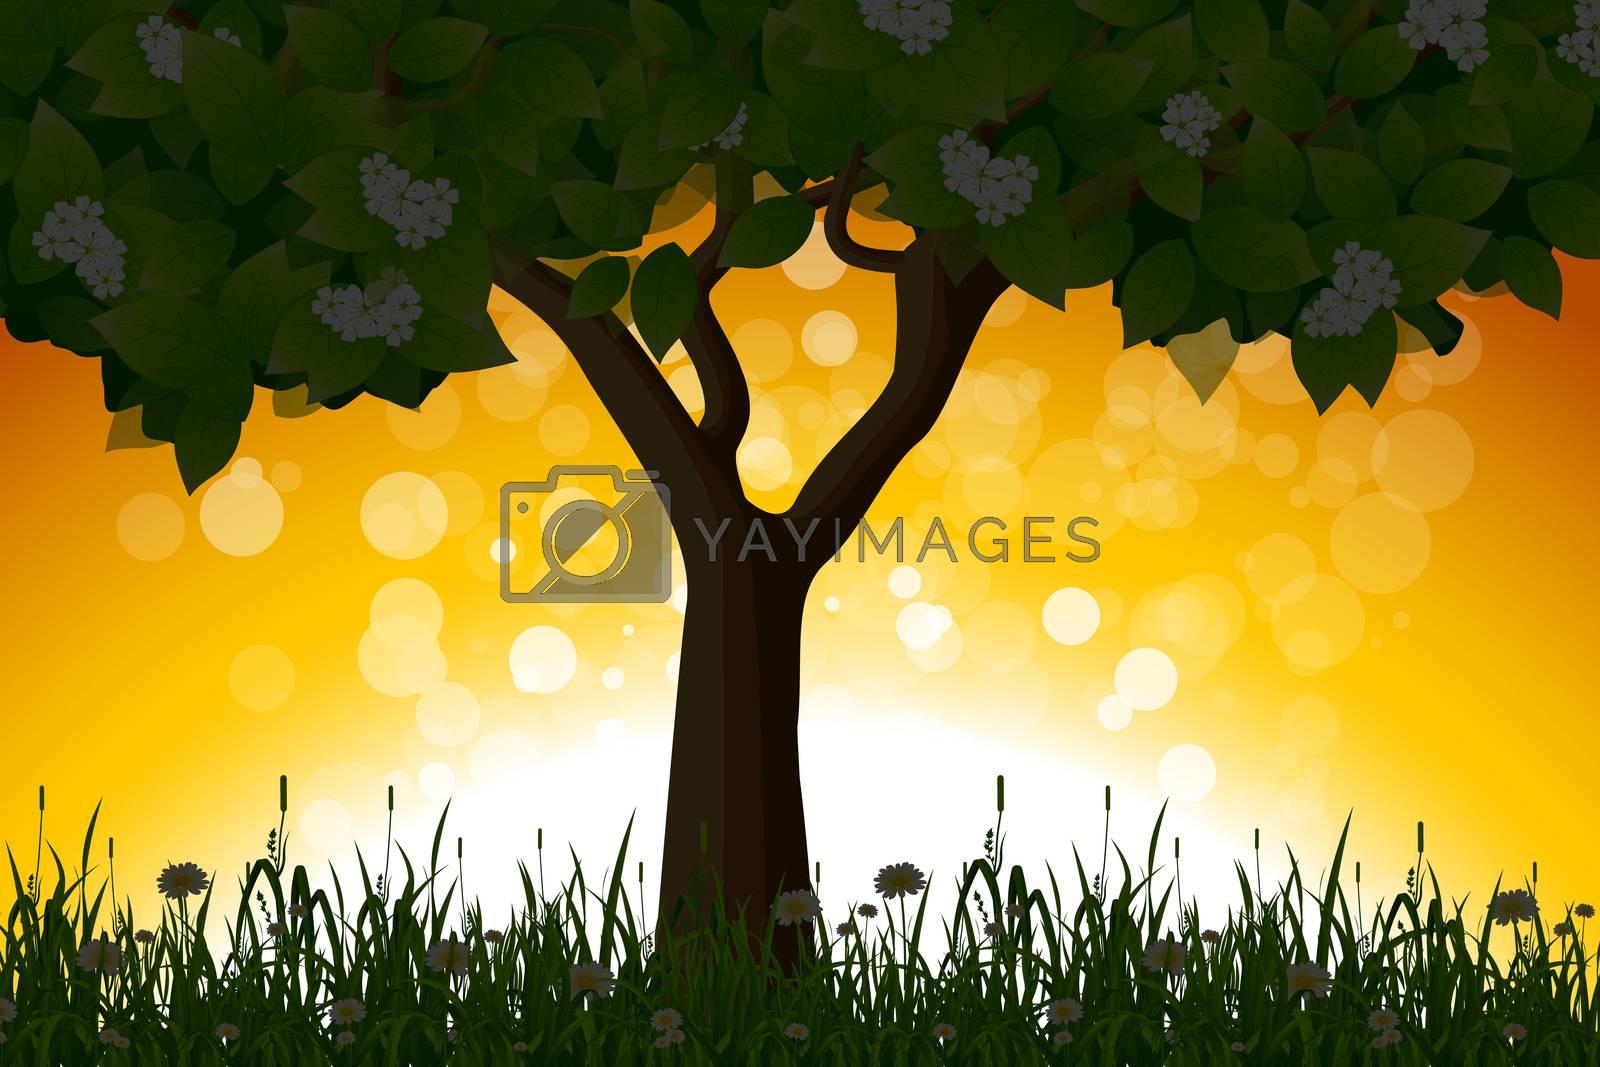 Amazing Sunrise Landscape with Tree by WaD